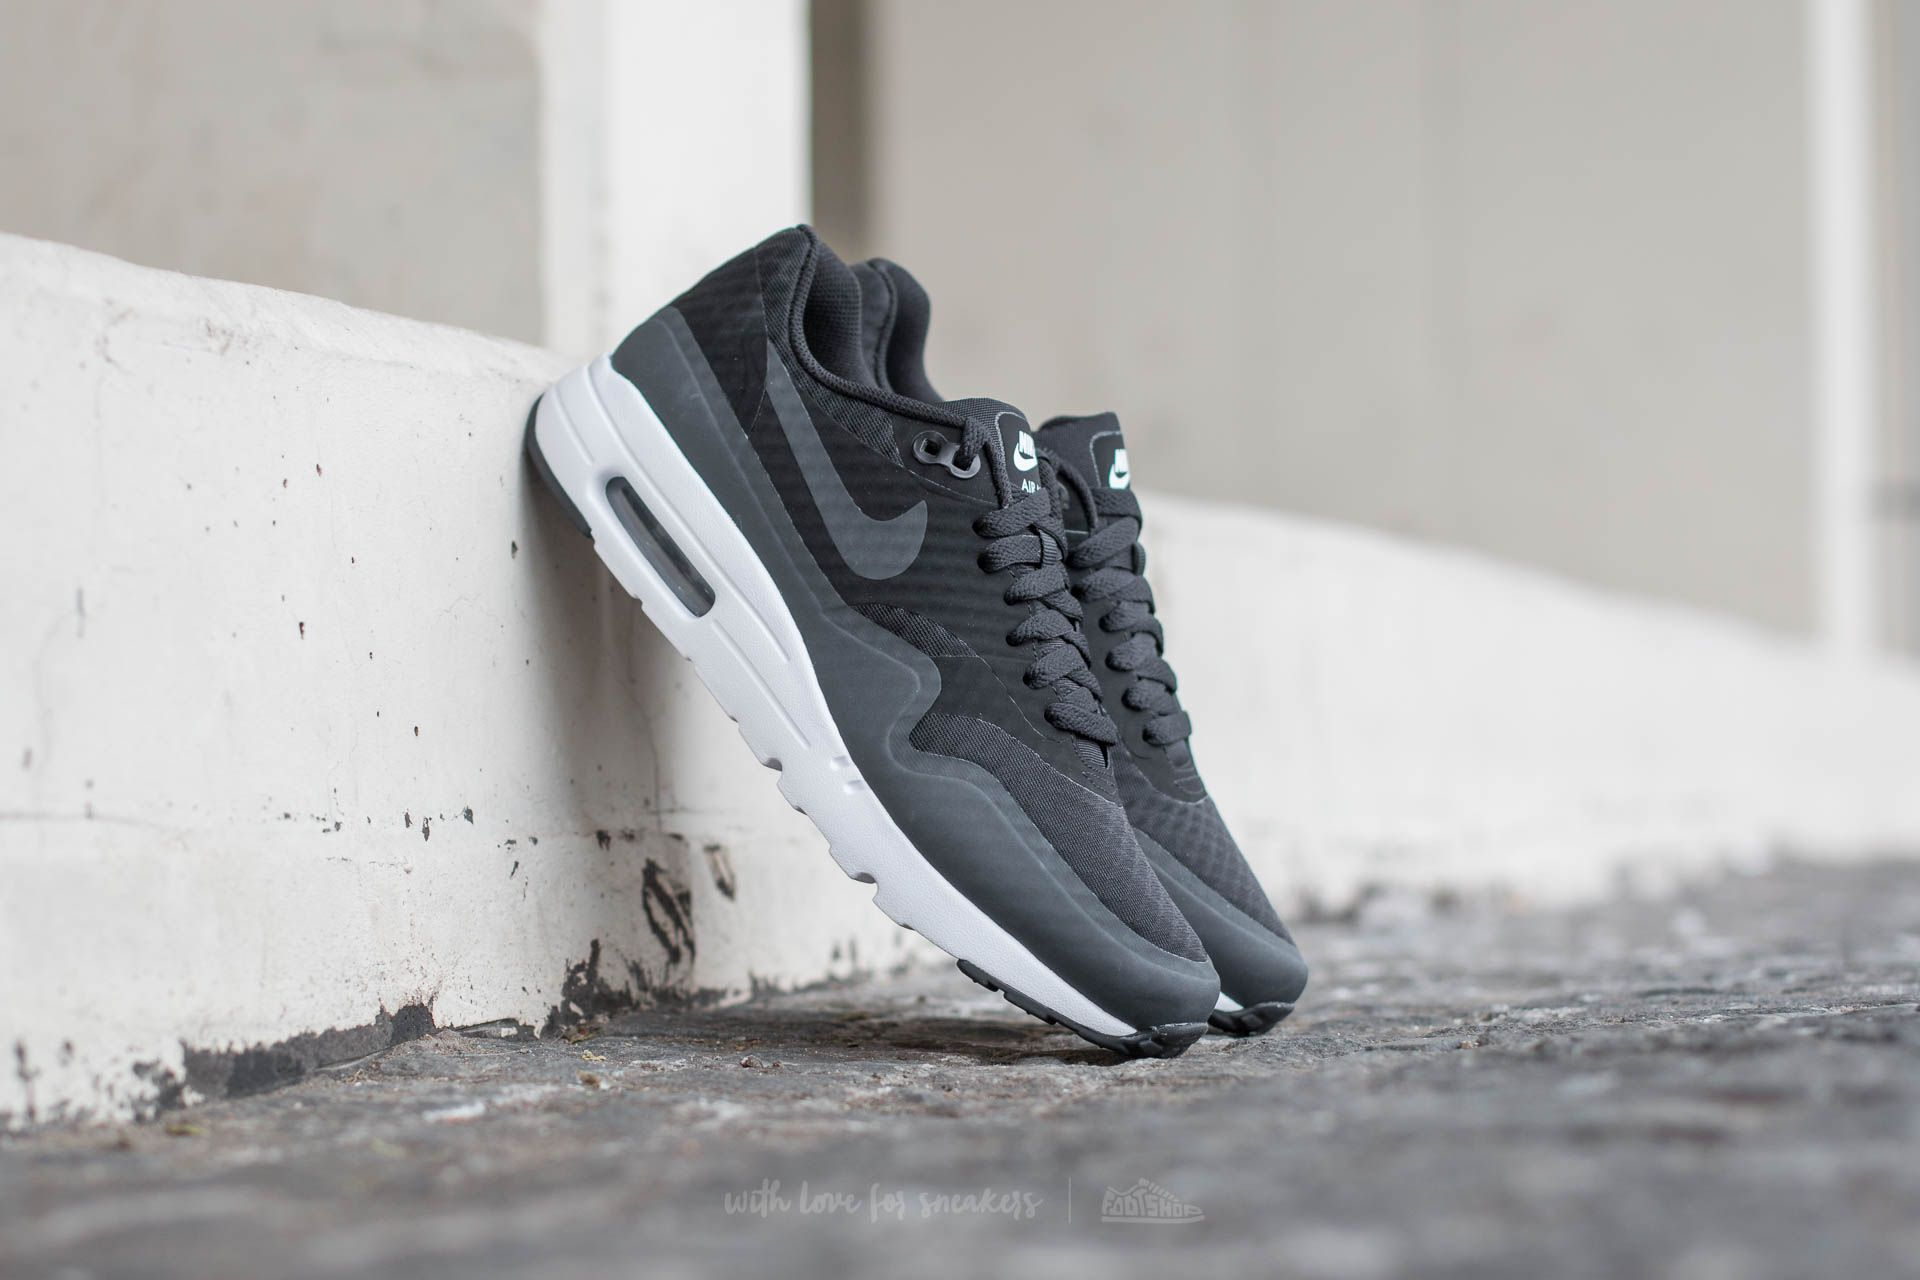 62d7e2c1f2 Nike Air Max 1 Ultra Essential Black/ Anthracite-White   Footshop